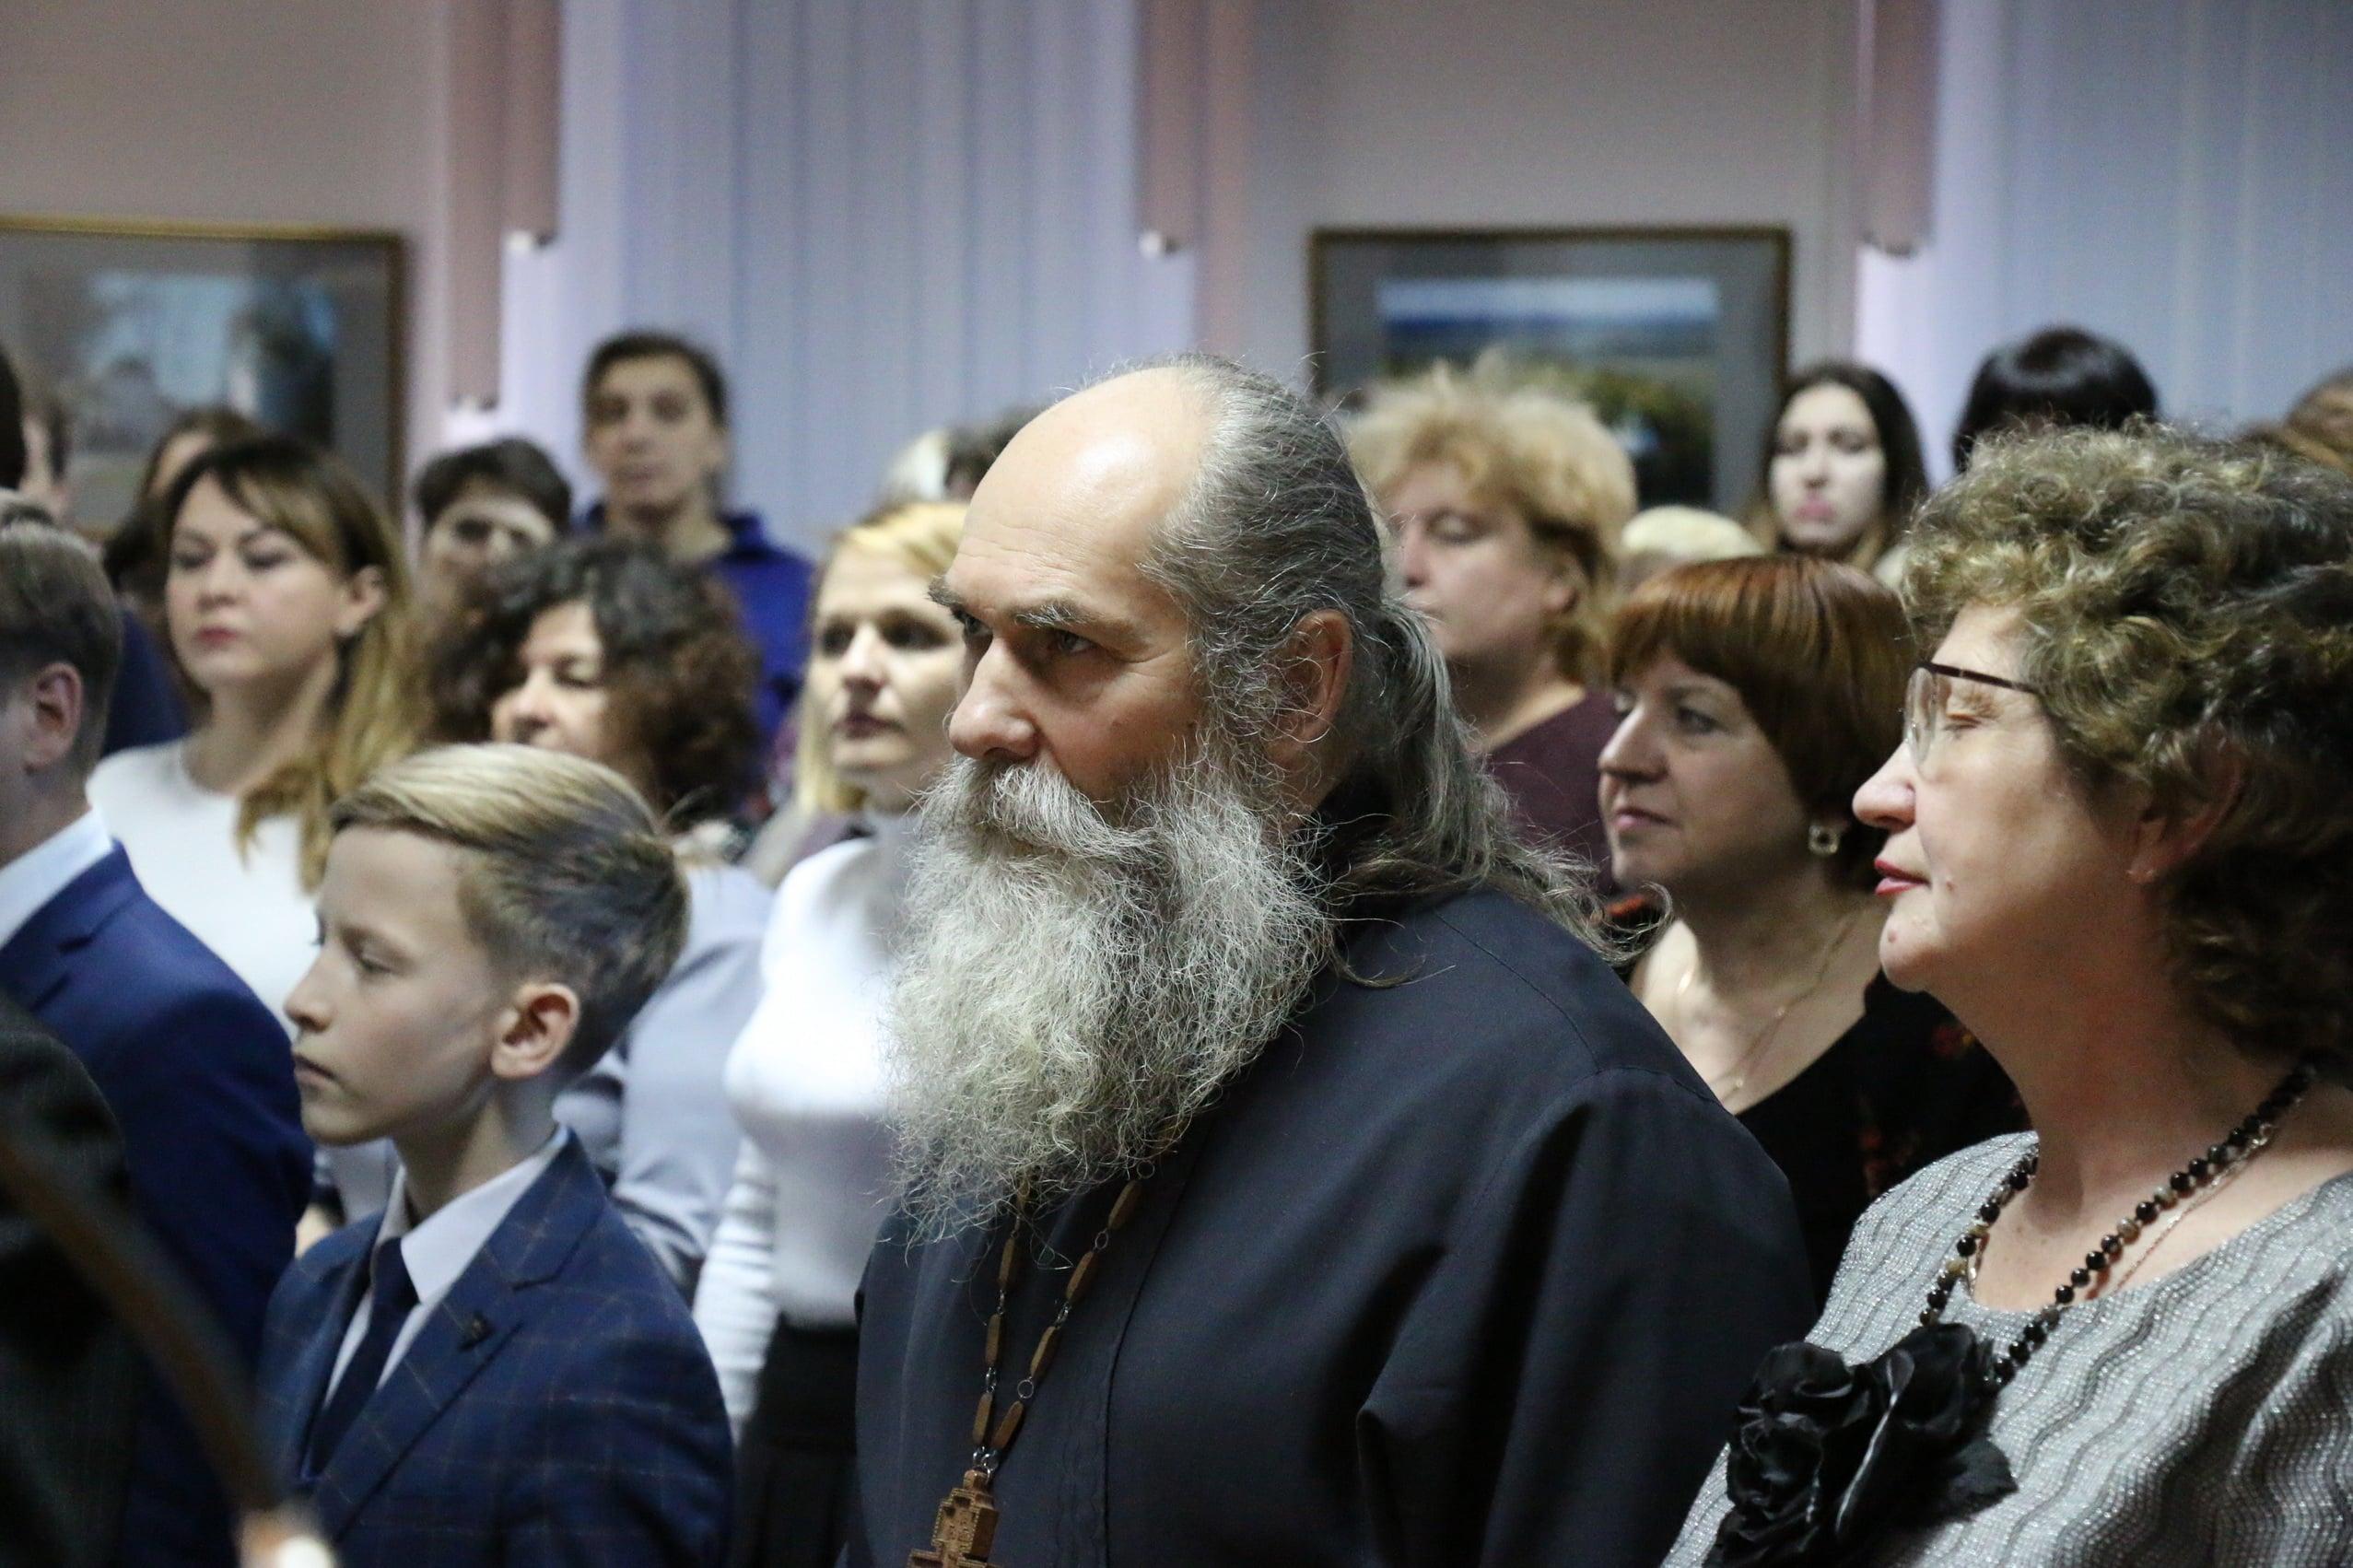 http://monuspen.ru/photoreports/06f1f0951a3799a9c804c7f0881a7668.JPG